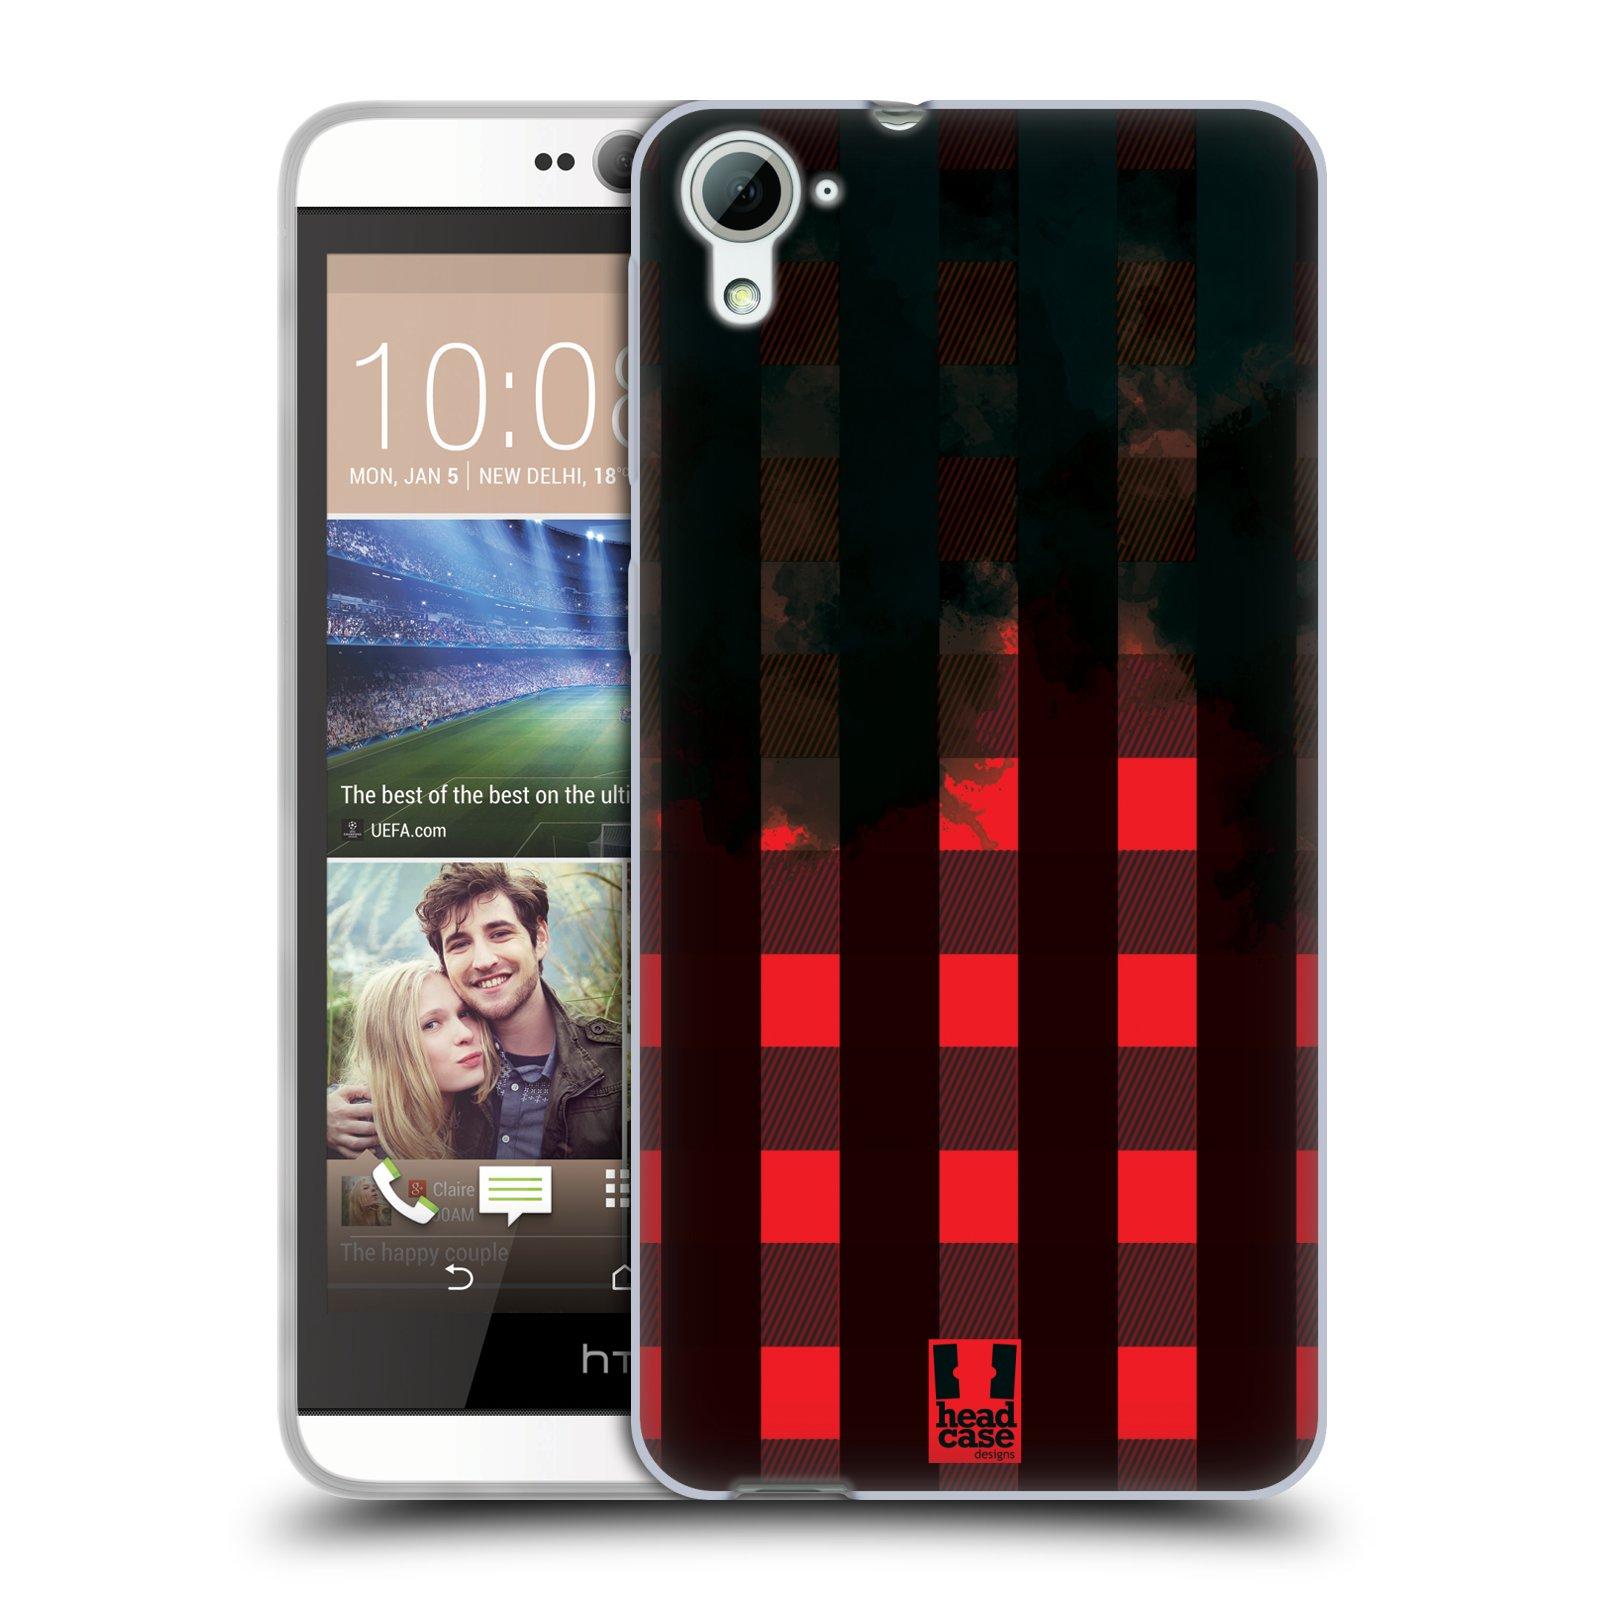 Silikonové pouzdro na mobil HTC Desire 826 HEAD CASE FLANEL RED BLACK (Silikonový kryt či obal na mobilní telefon HTC Desire 826 Dual SIM)